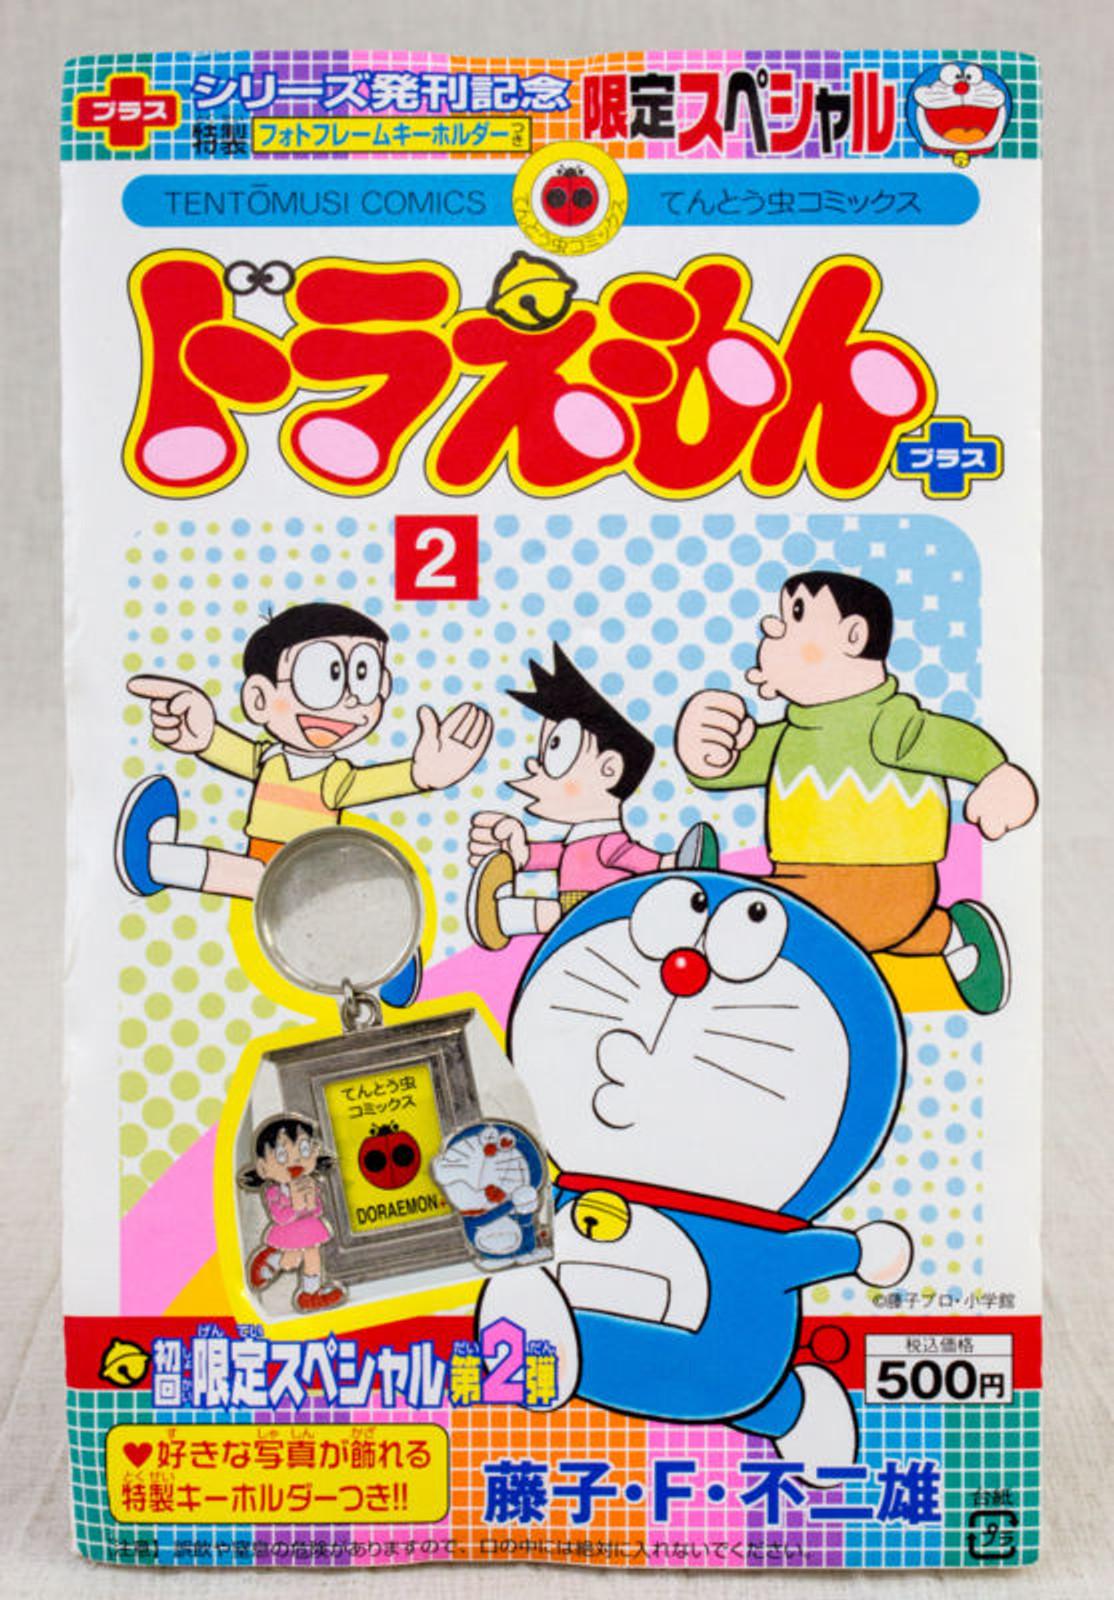 Doraemon Keychain with mini Photo frame Limited JAPAN ANIME MANGA FUJIO